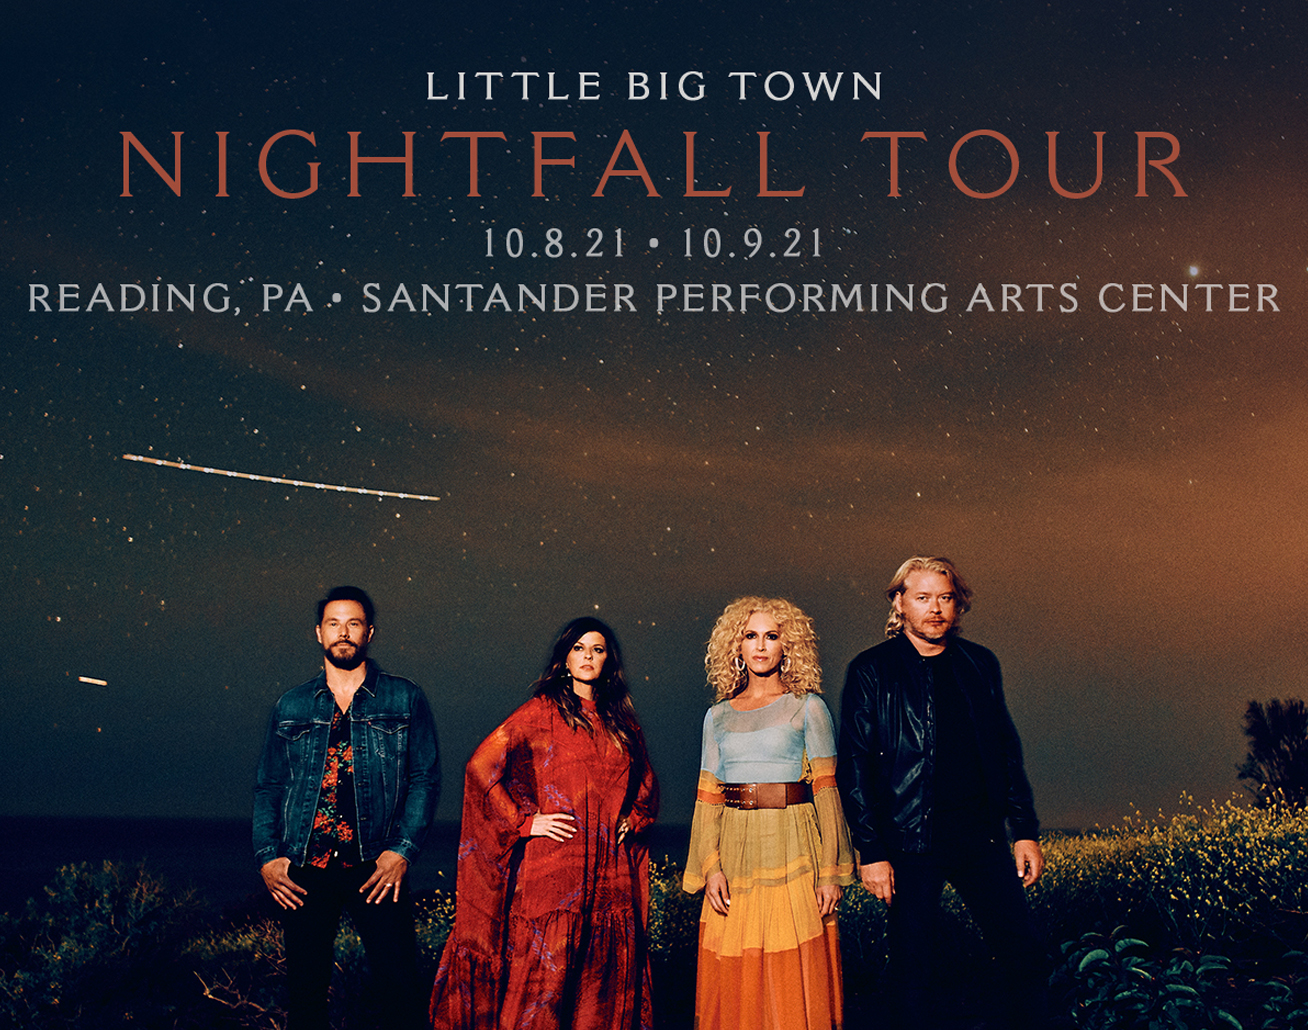 Little Big Town at Santander Performing Arts Center on October 8-9